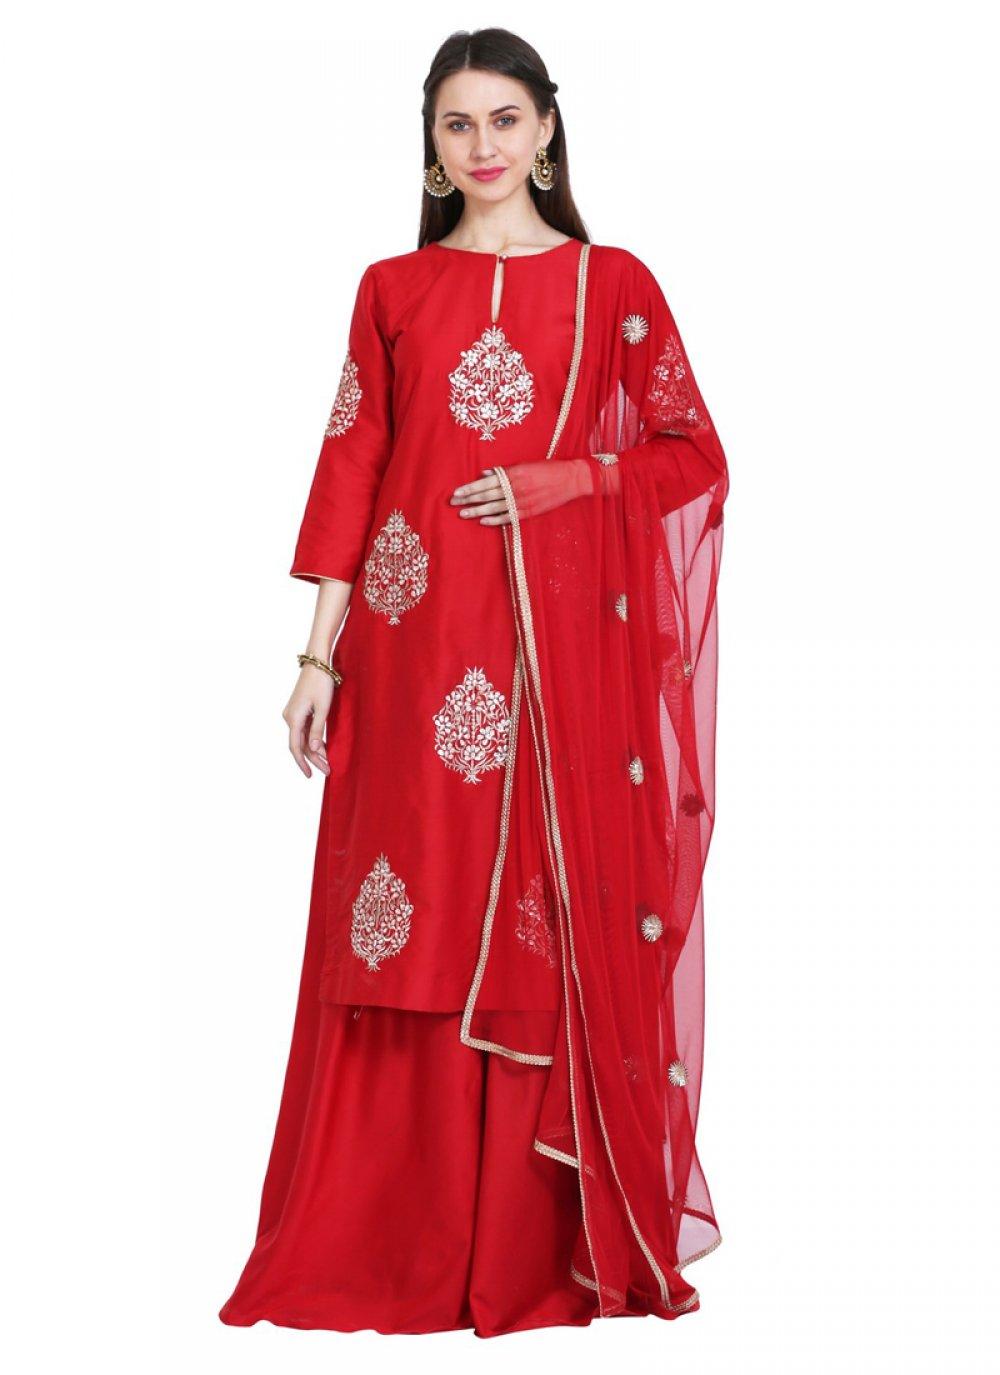 Cotton Silk Readymade Salwar Kameez in Red